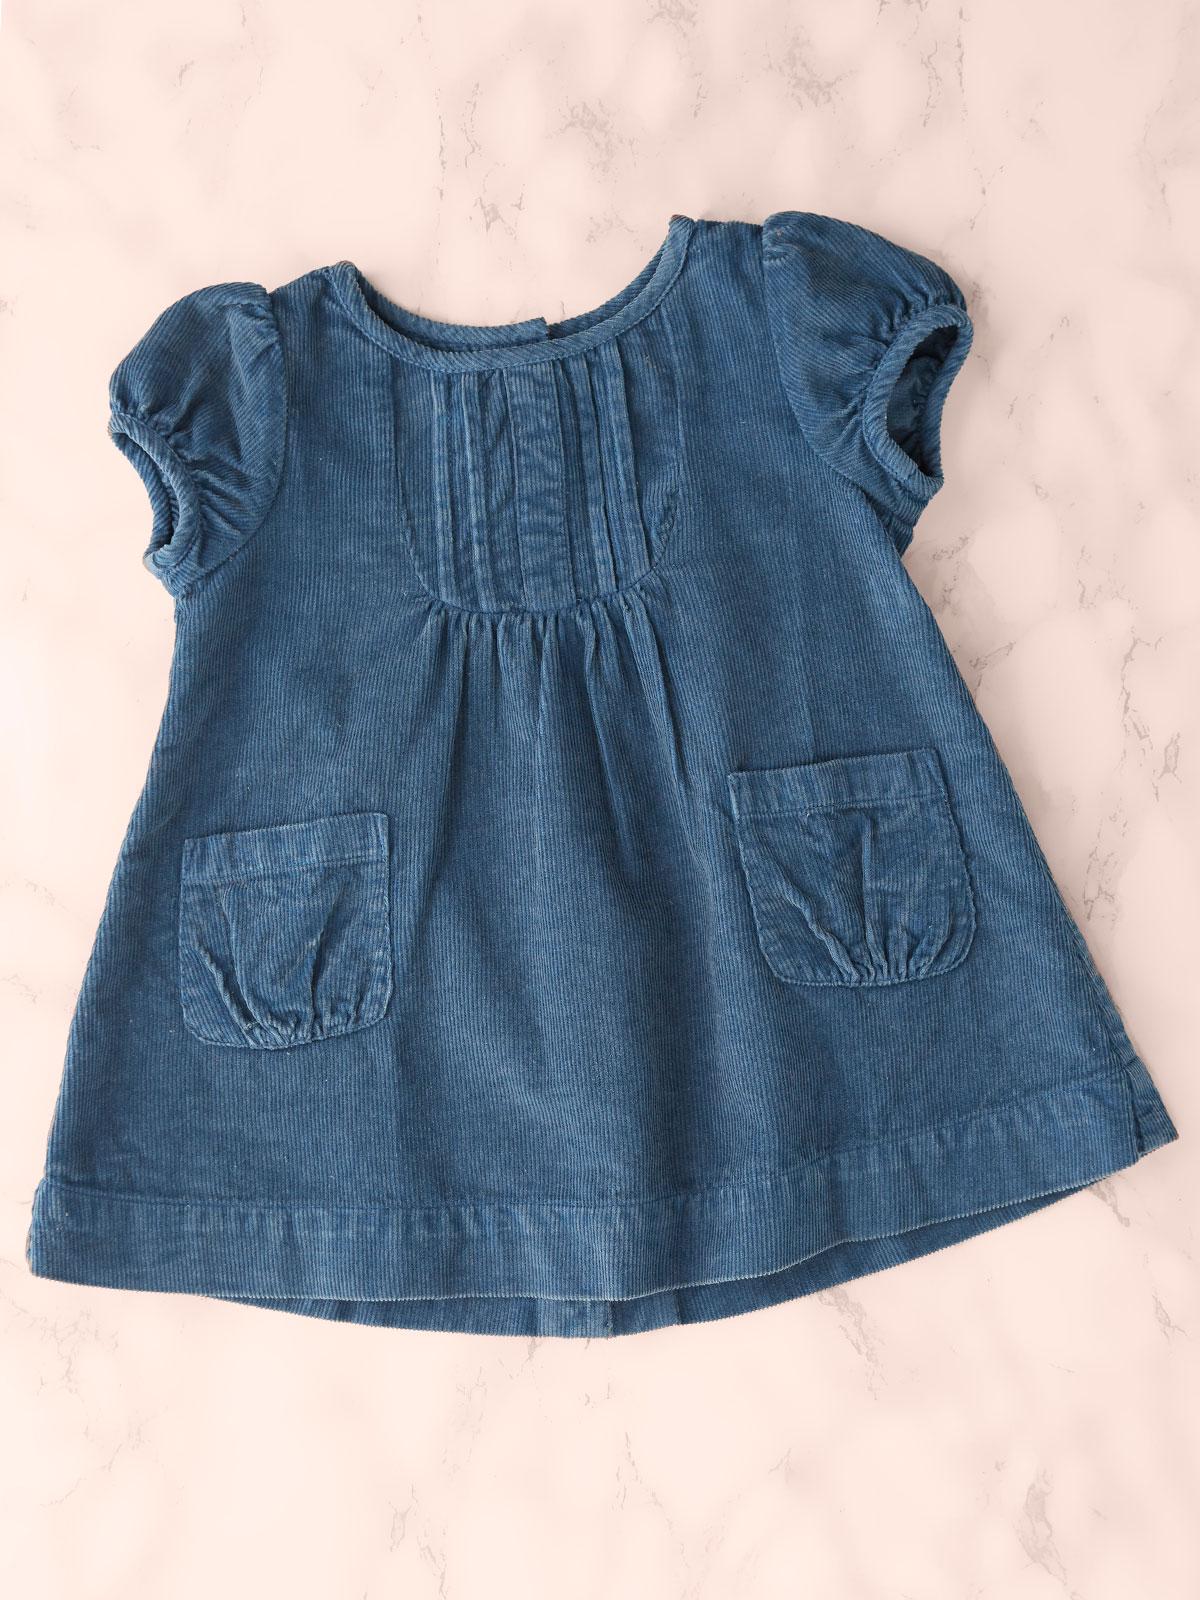 Playtime Corduroy Baby Dress